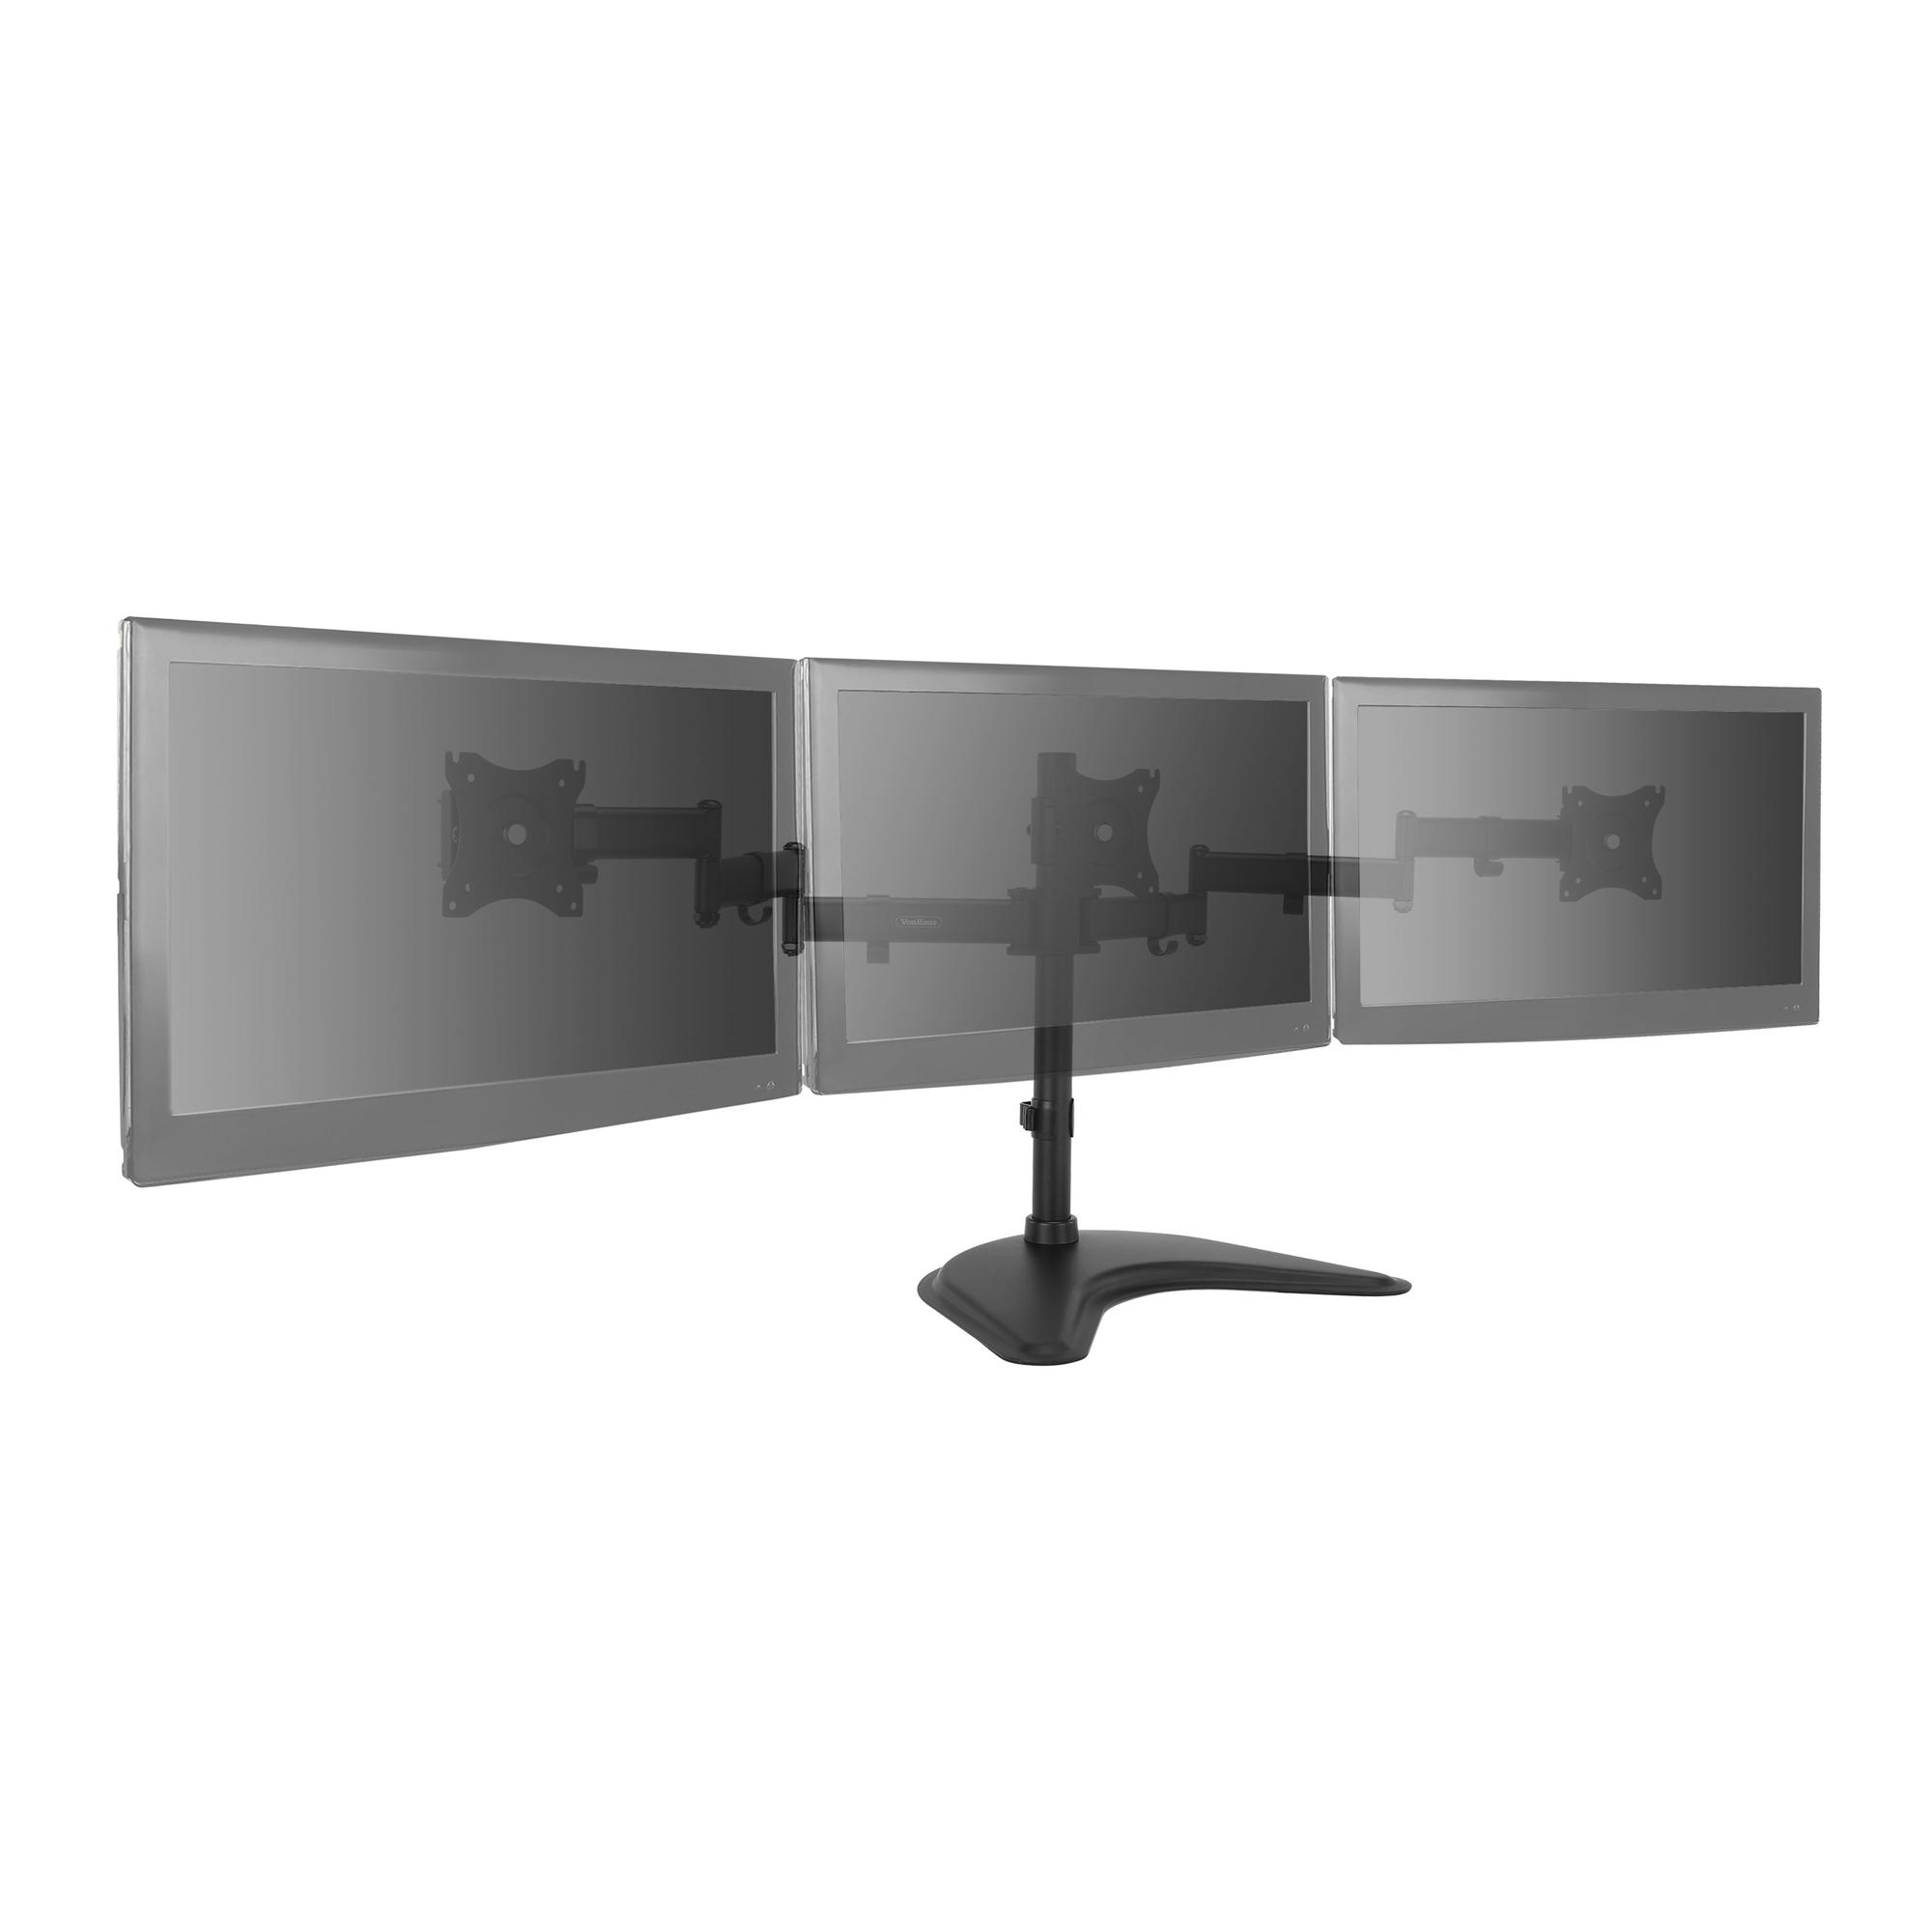 Vonhaus Triple Arm Monitor Mount For 13 27 Screens Three